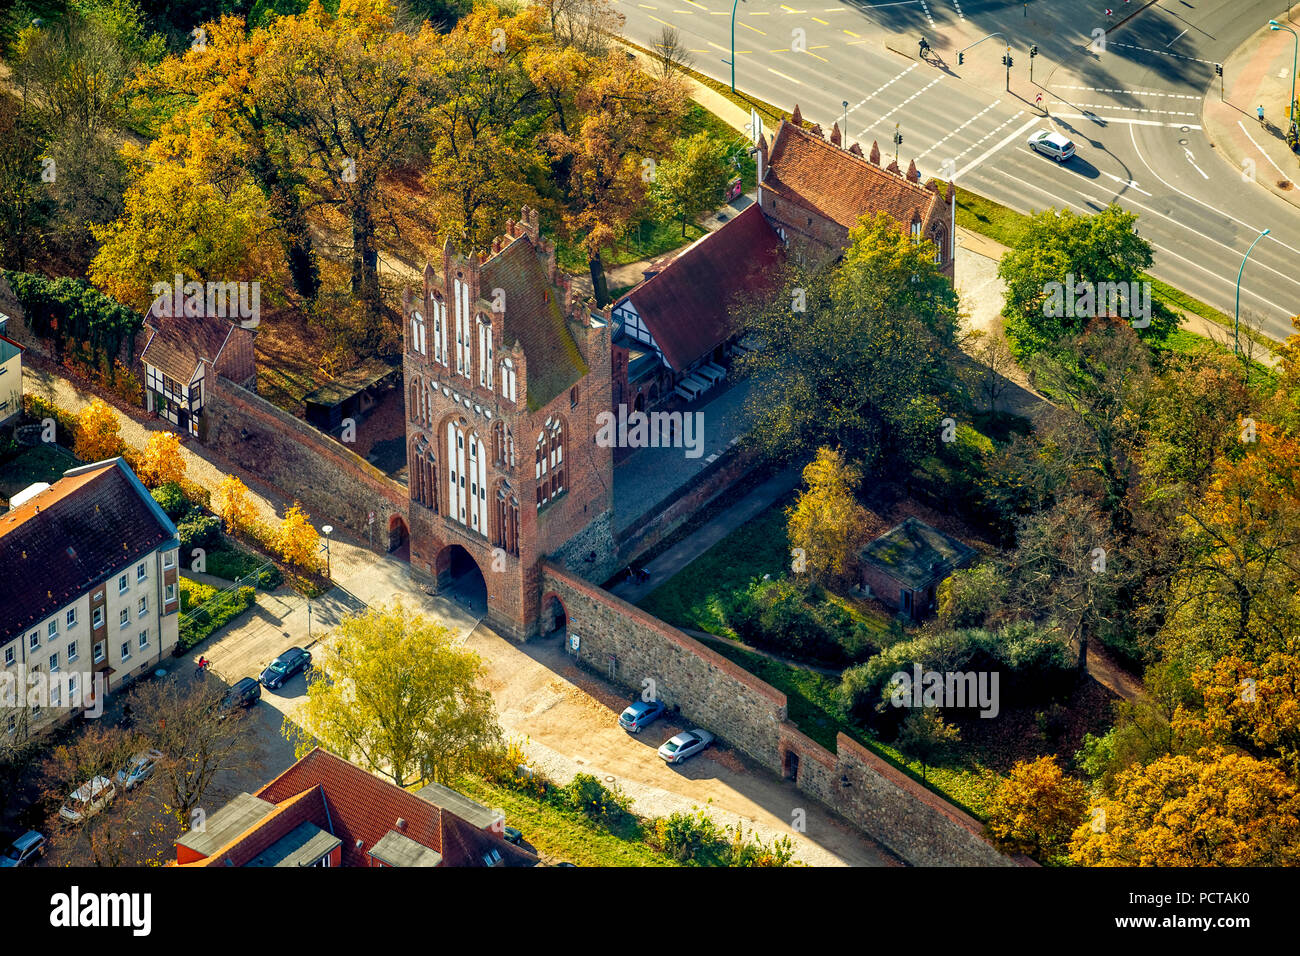 City gate in the style of the brick Gothic, Neubrandenburg, Mecklenburg Lake District, Müritz, Mecklenburg-West Pomerania, Germany - Stock Image